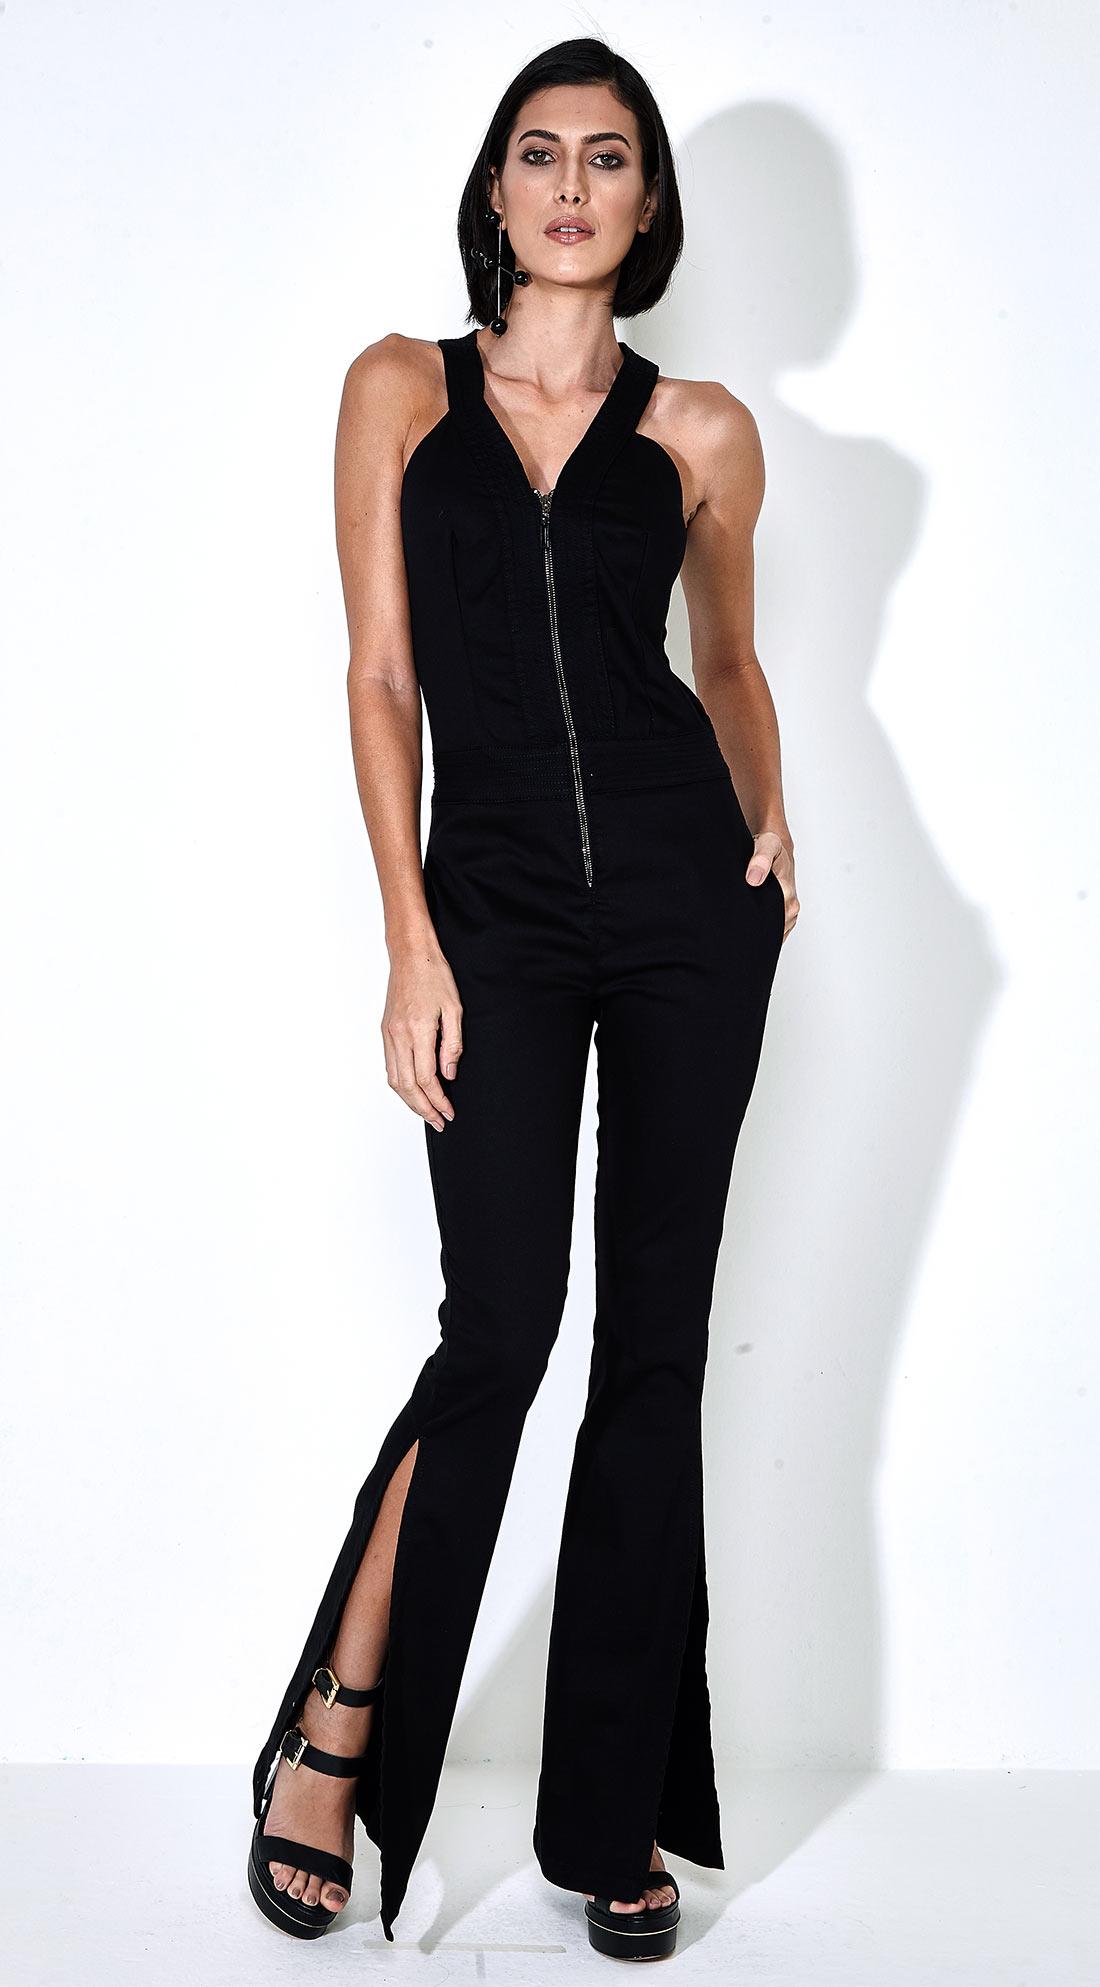 626c1ad08 Macacao Jeans Longo Com Decote Ziper Hypercurve Jeans - morenarosa